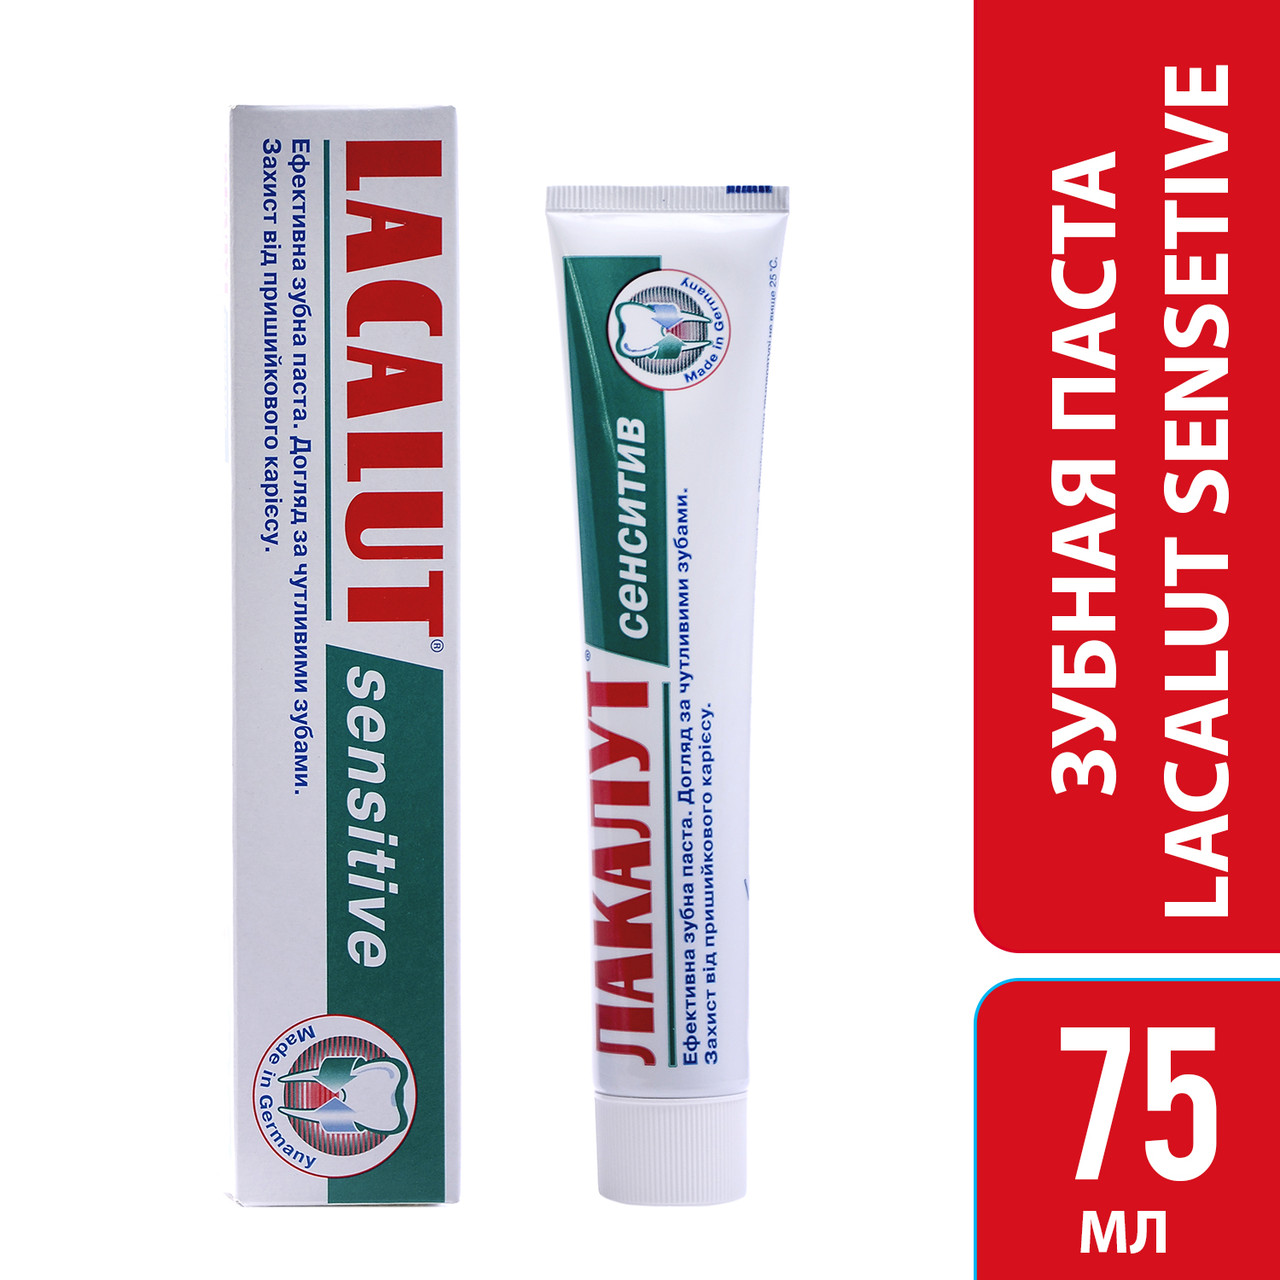 Лакалут сенситів зубна паста 75 мл, шт